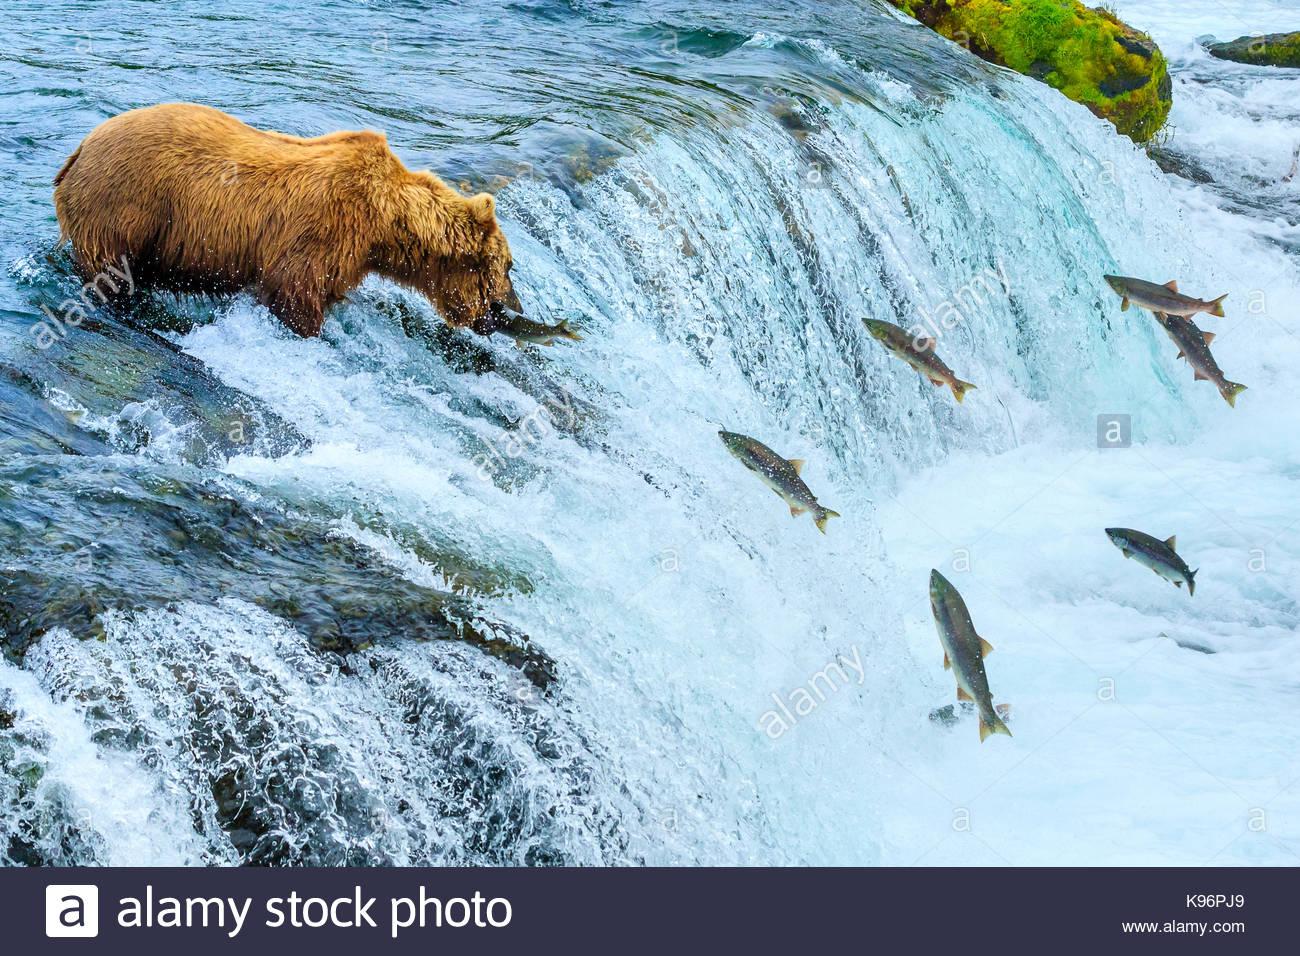 Oso Pardo, Ursus arctos, pesca de salmones sockeye riachuelos cae. Imagen De Stock